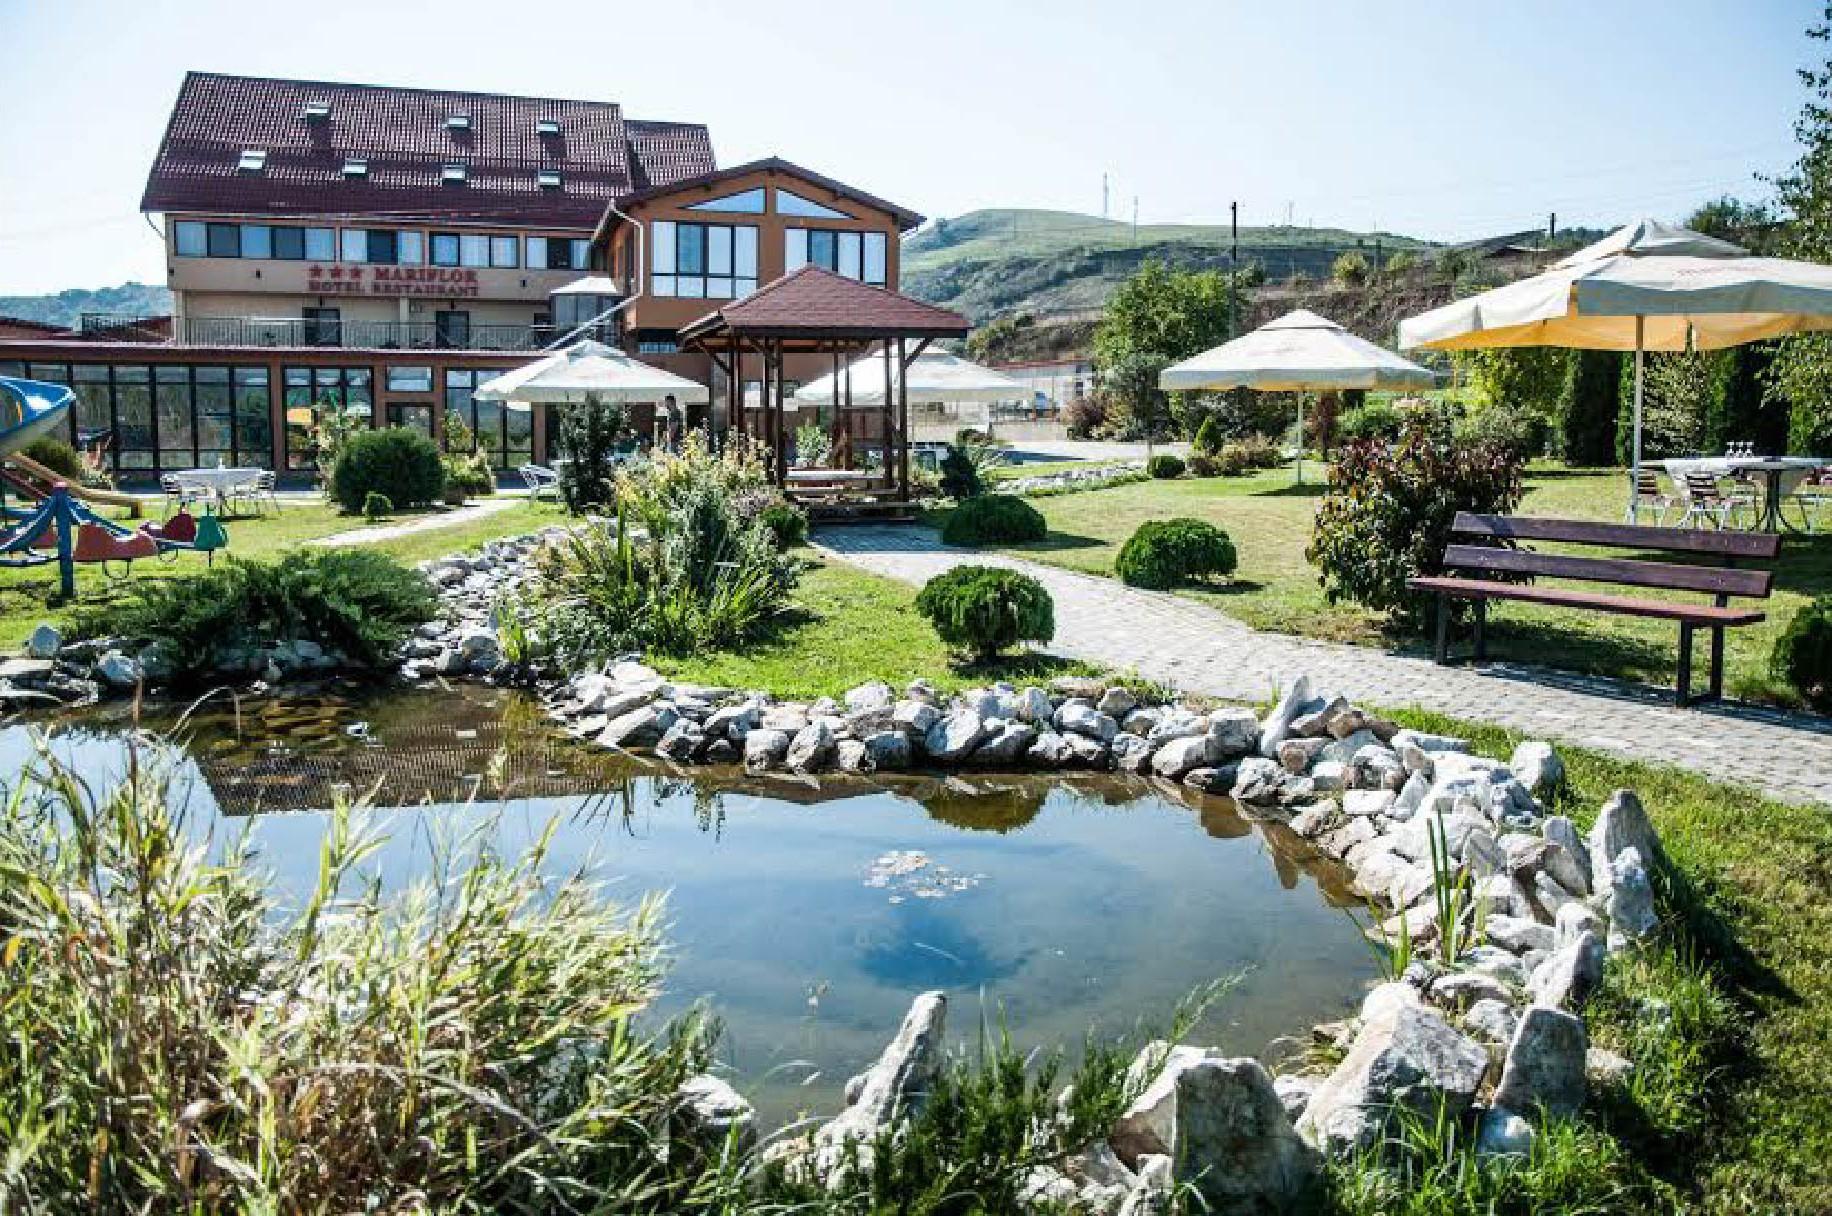 Restaurant Hotel Mariflor